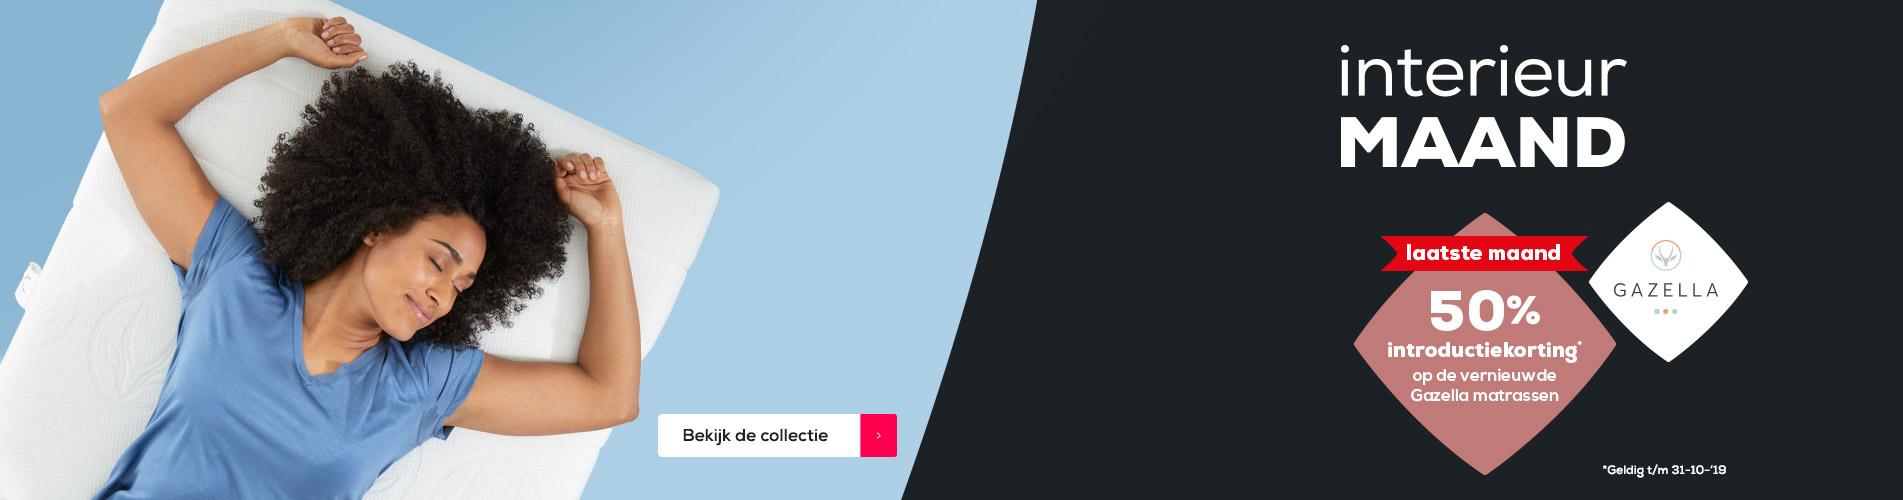 Matrassen | Gazella matrassen 50% introductievoordeel | Swiss Sense